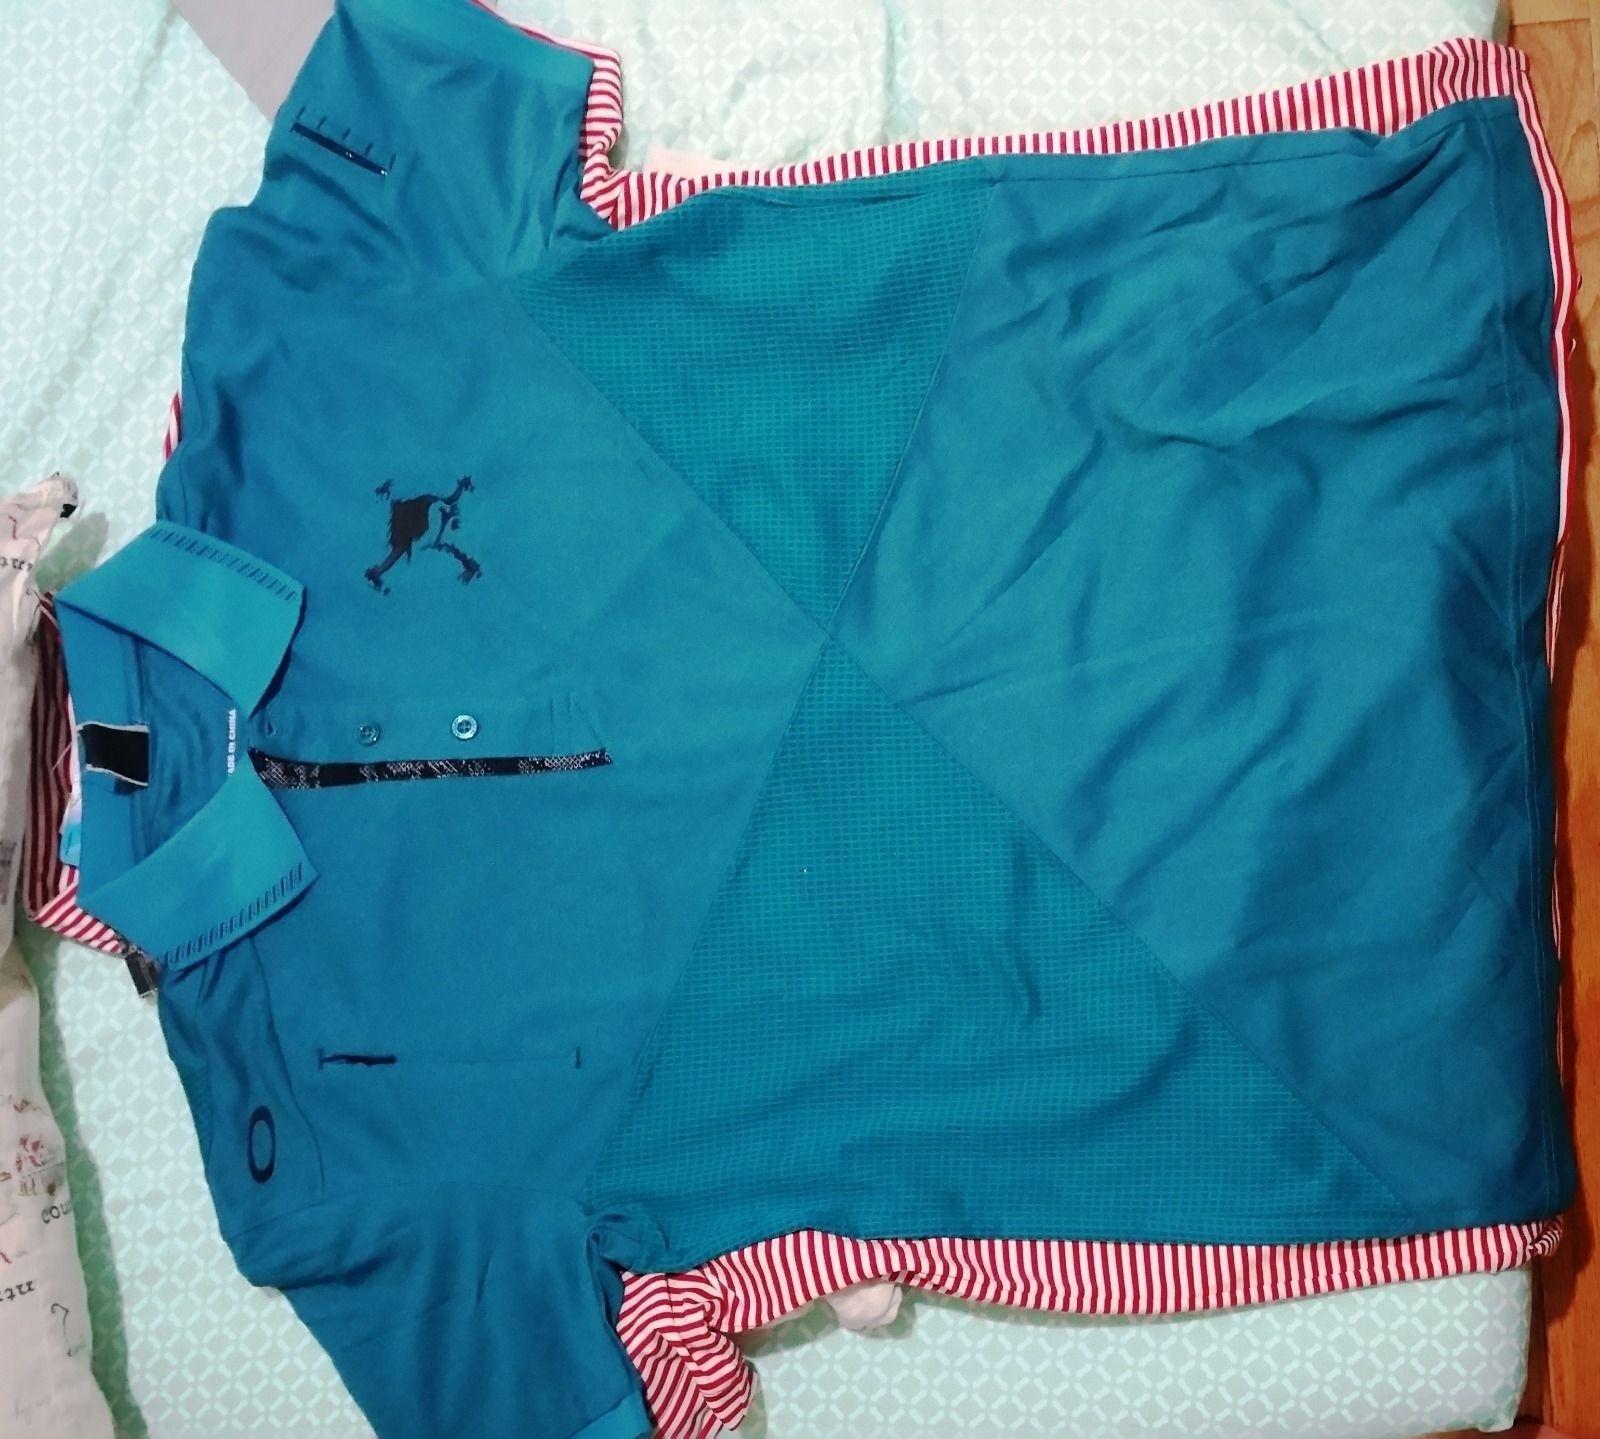 oakley skull polo shirt - s-l1600 (1).jpg